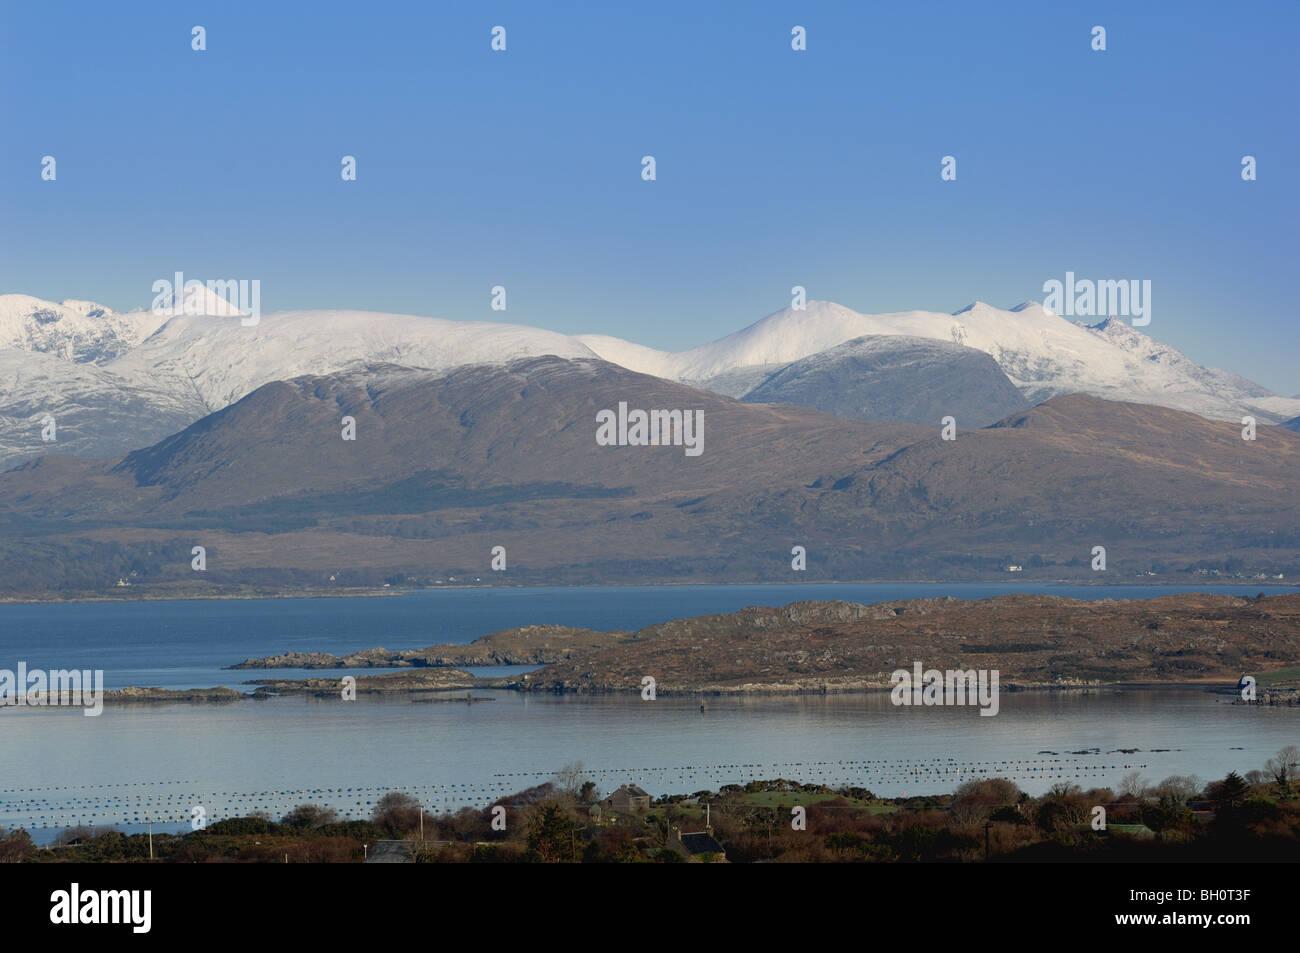 County Kerry, Ireland - Stock Image